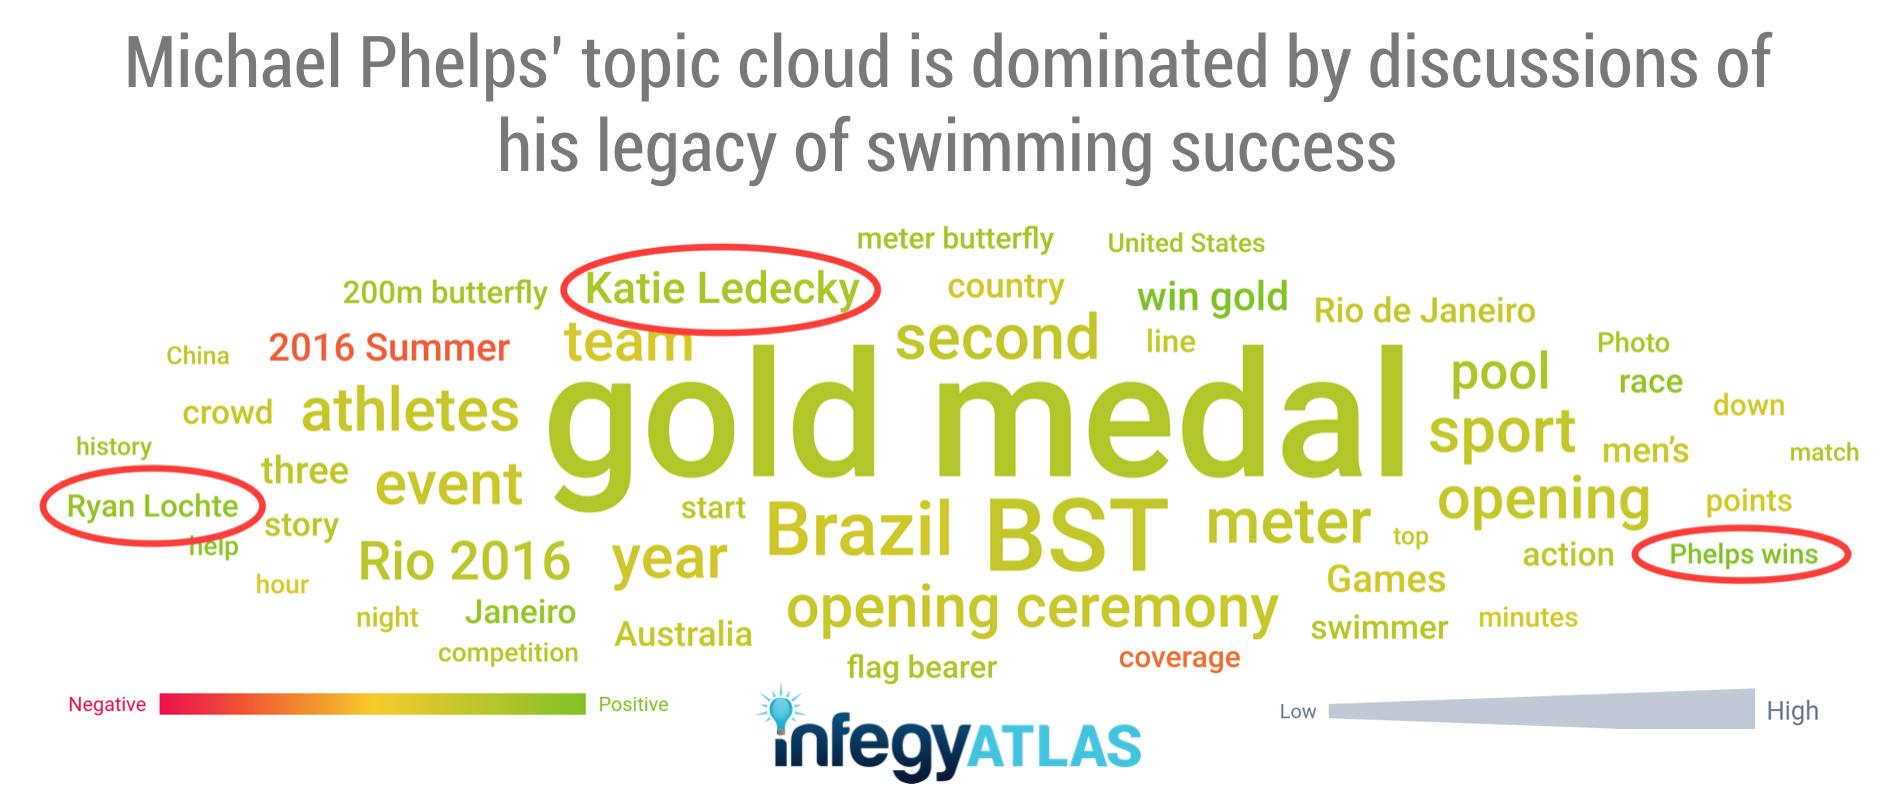 michael-phelps-social-media-monitoring-legacy-of-swimming-success.png